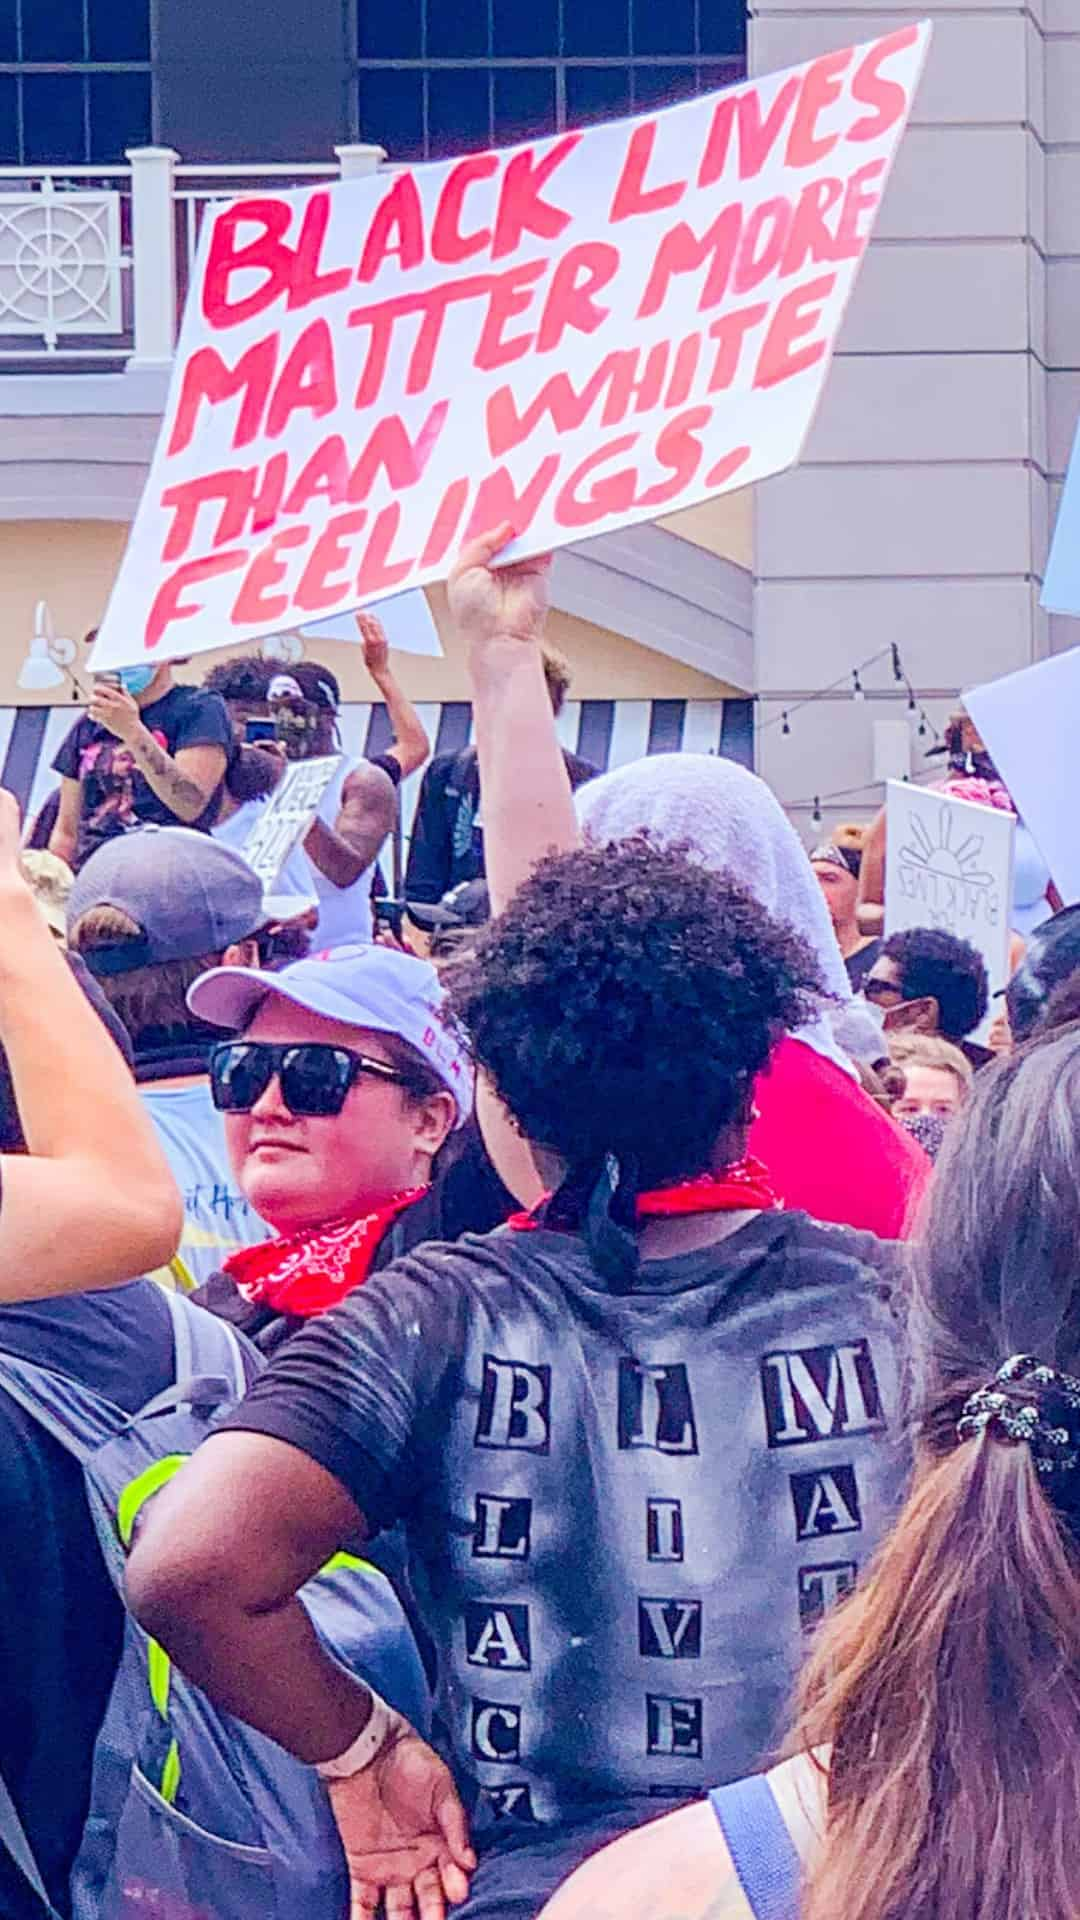 Black lives matter more than White feelings BLM protest sign